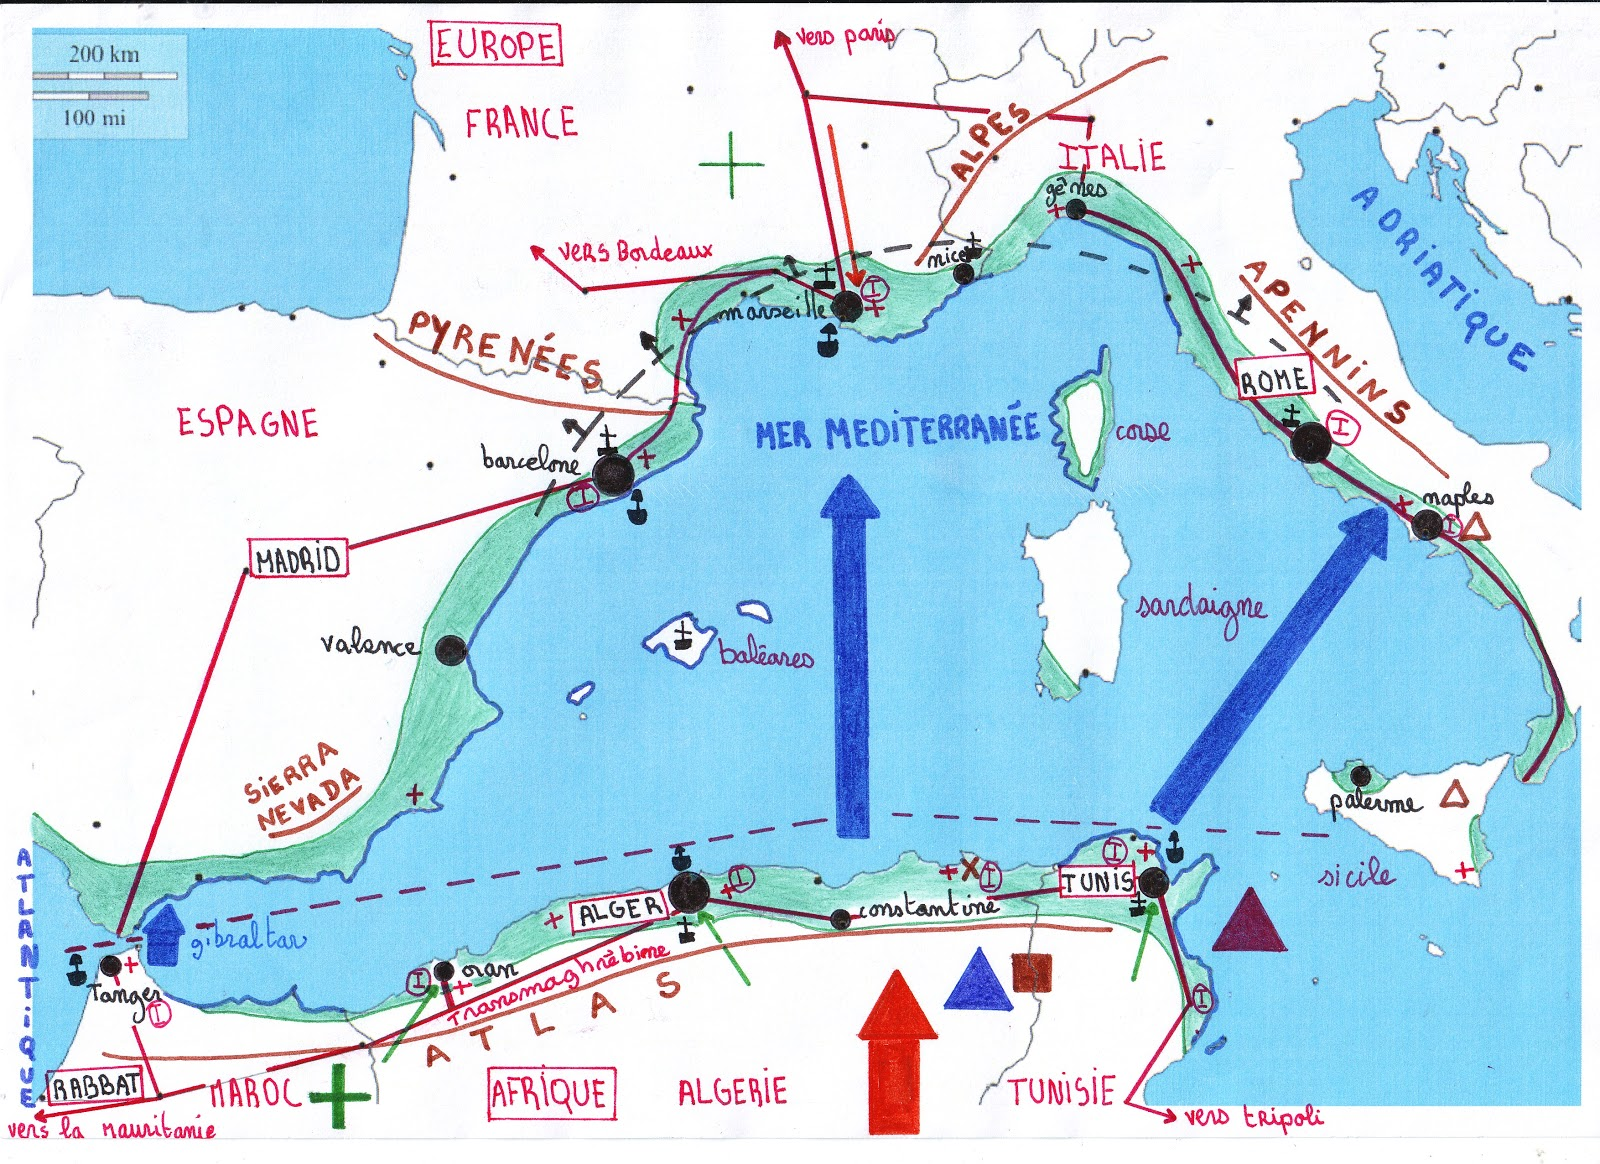 Concours Carto 4ème: Carte les littoraux de la Mer Méditerranée Occidentale